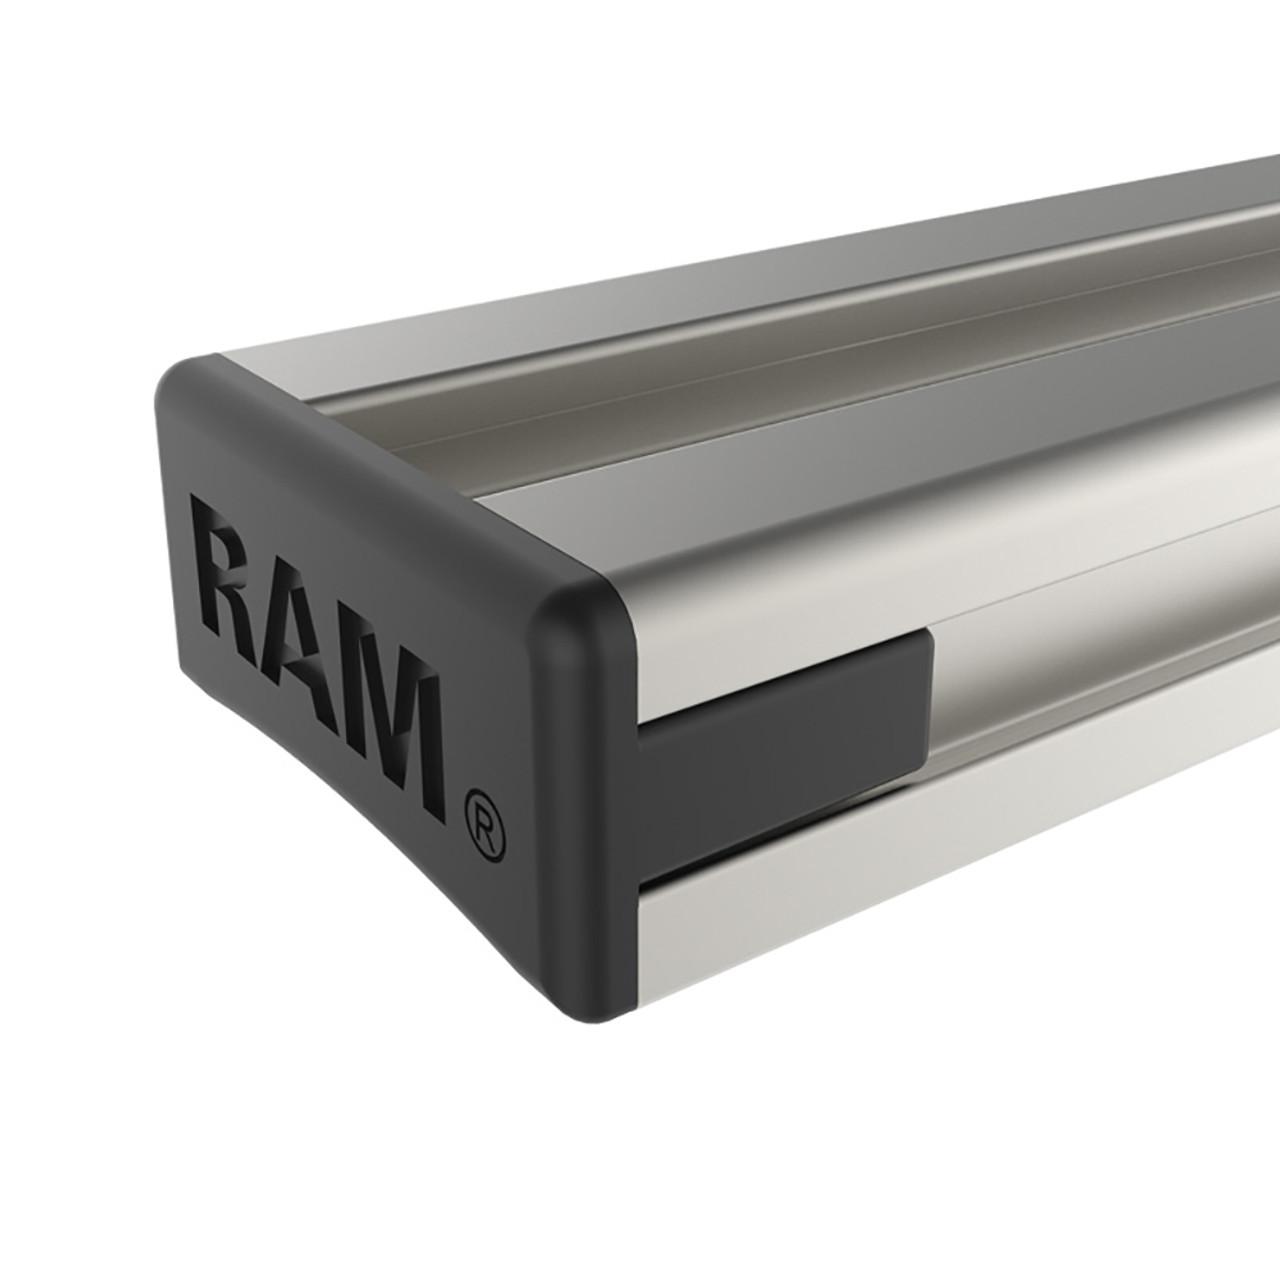 "Ram Mount 17"" Extruded Aluminum Tough-Track [RAM-TRACK-EXA-17]"